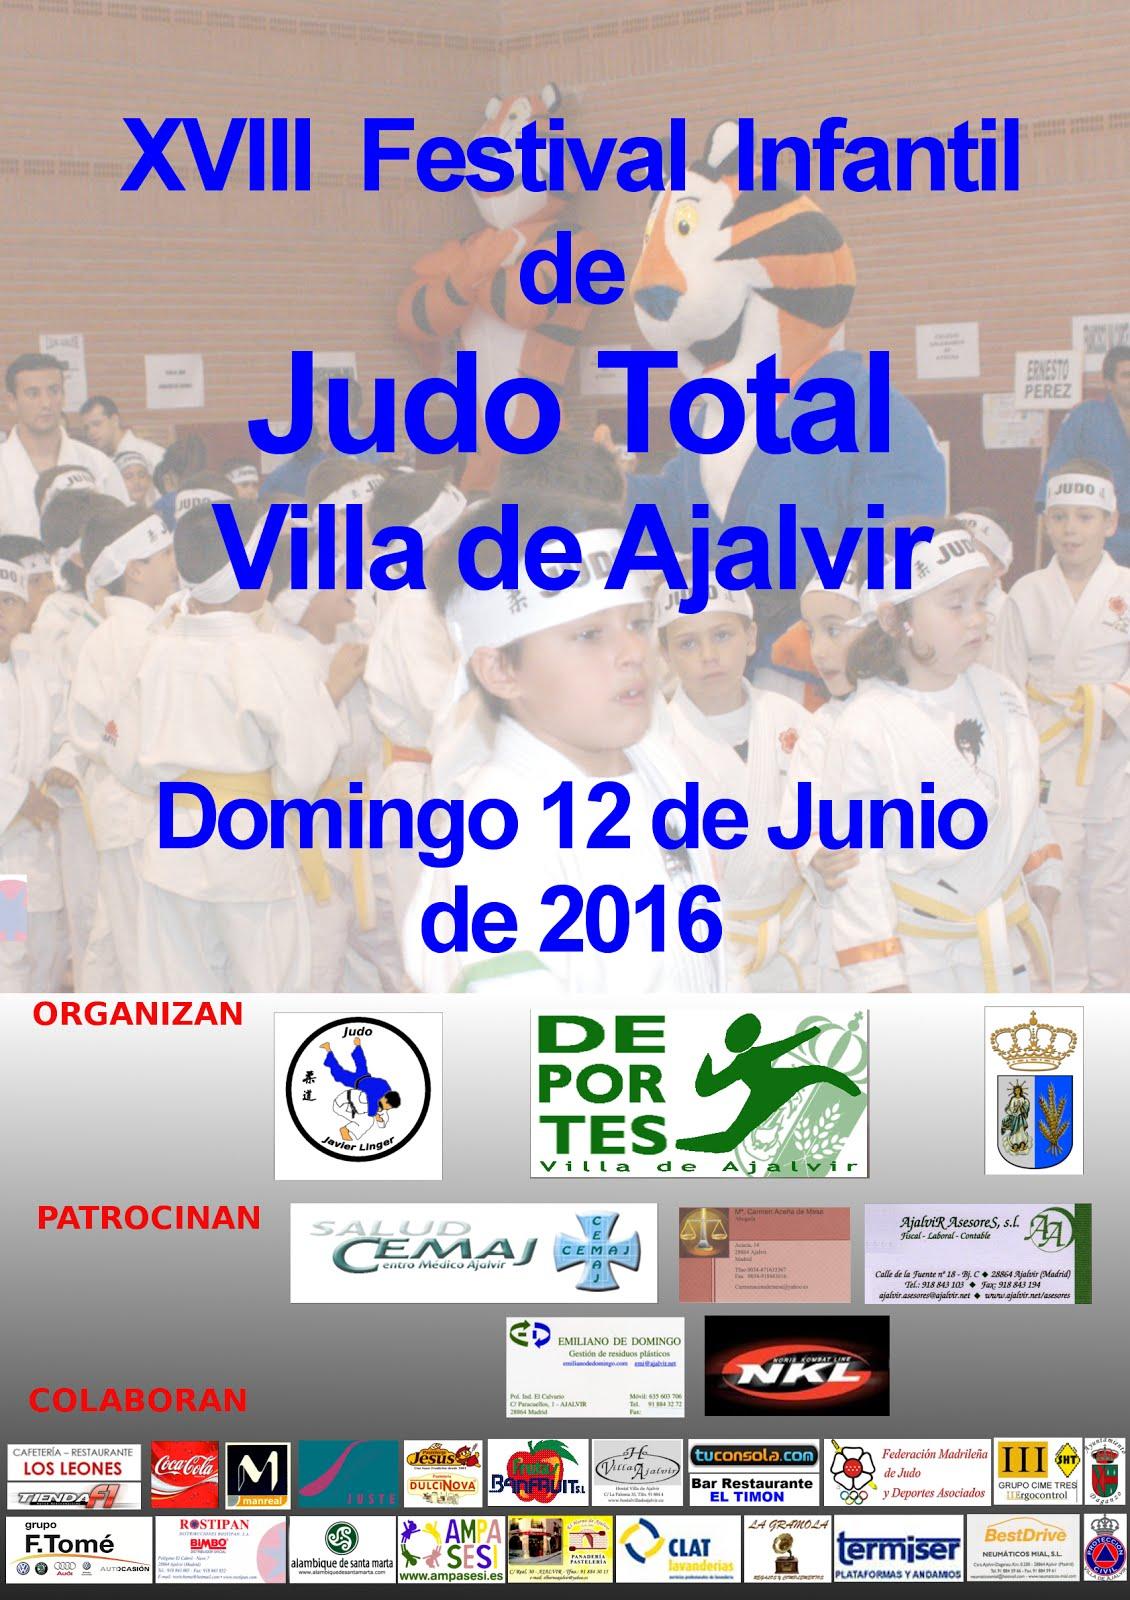 XVIII FESTIVAL DE YUDO INFANTIL VILLA DE AJALVIR 2016